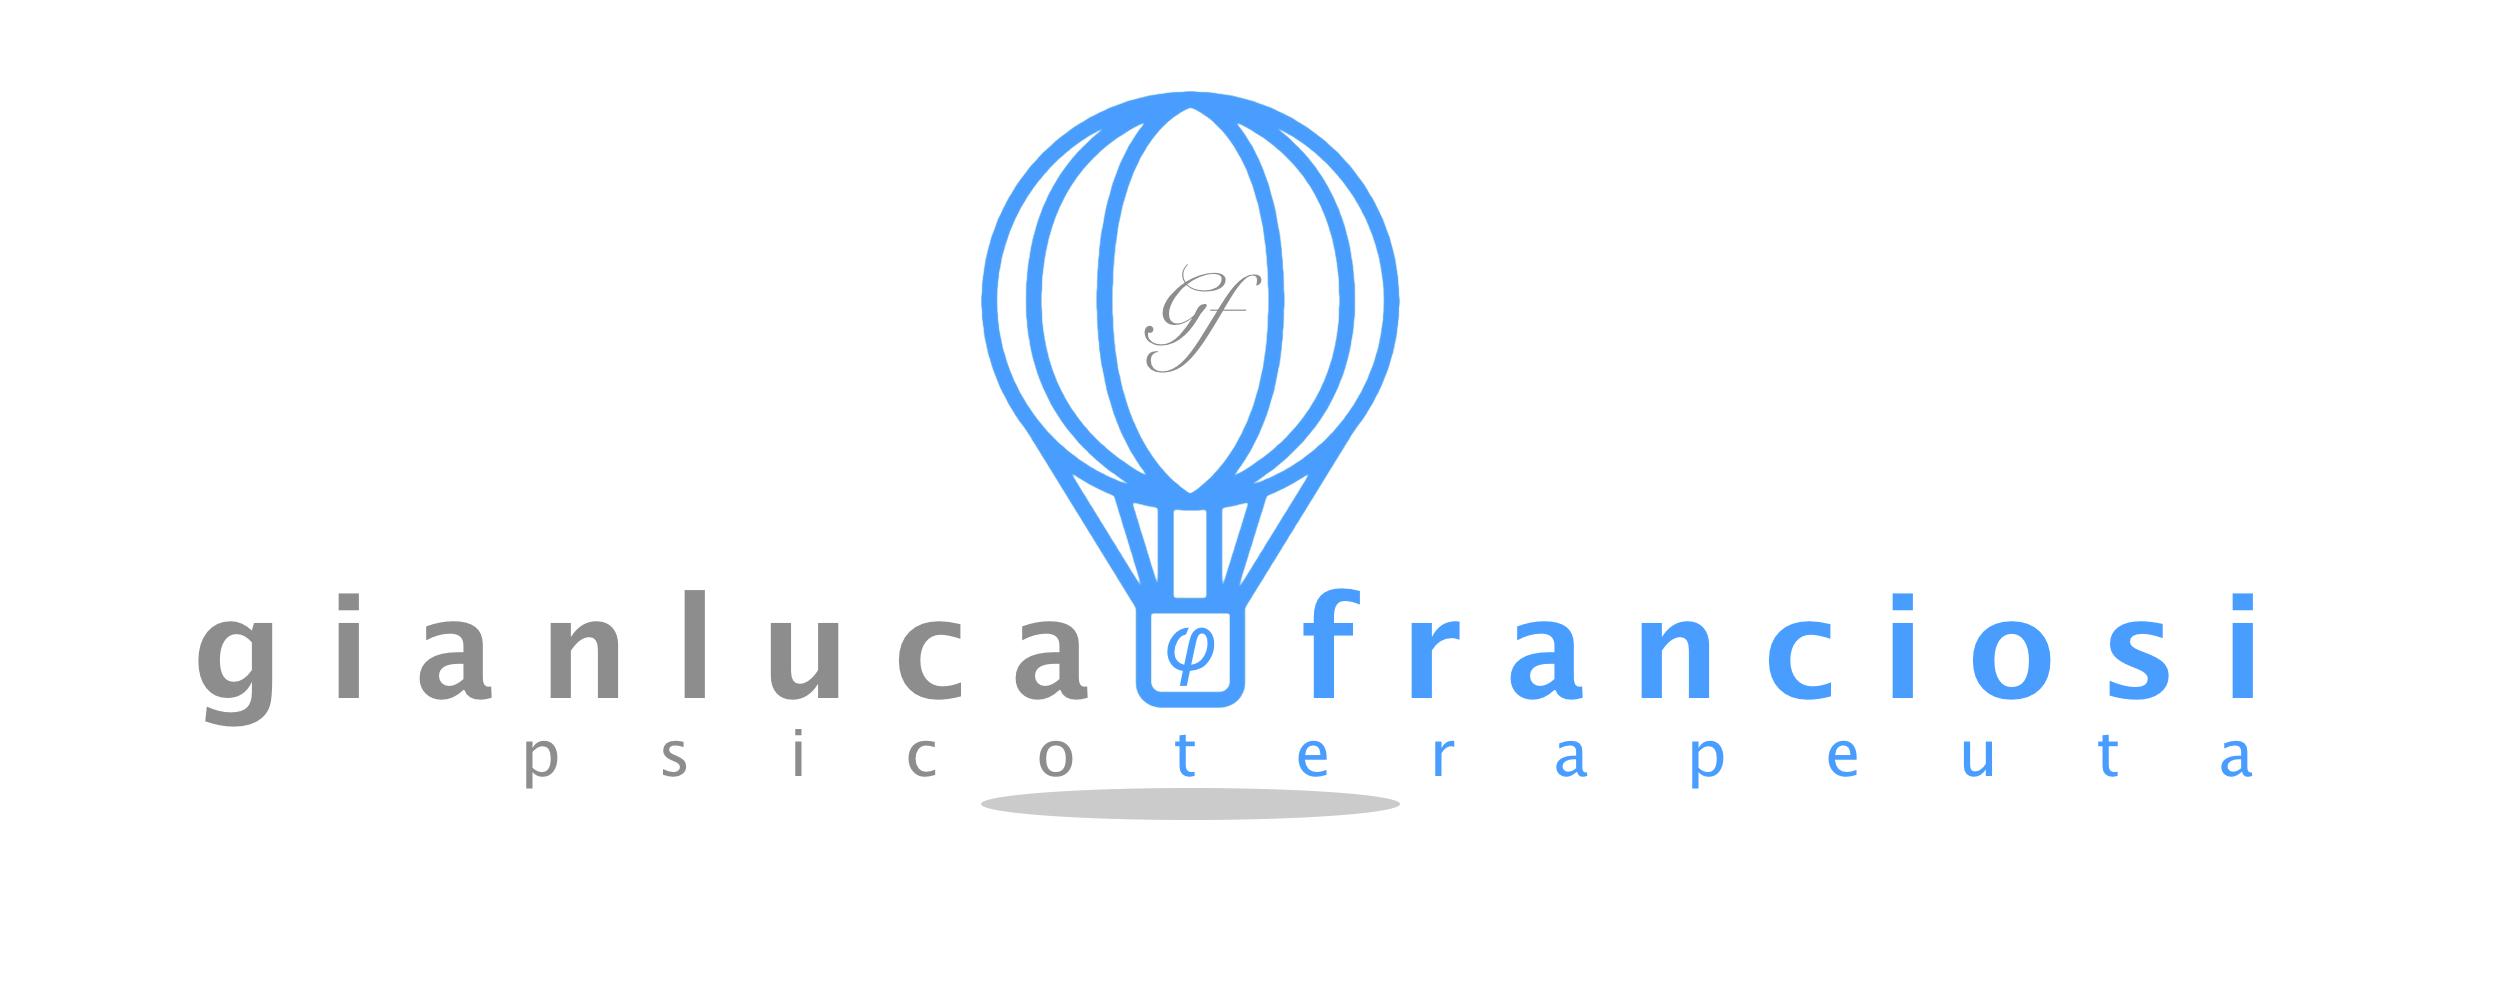 Dott. Gianluca Franciosi – Psychologe und Psychotherapeut